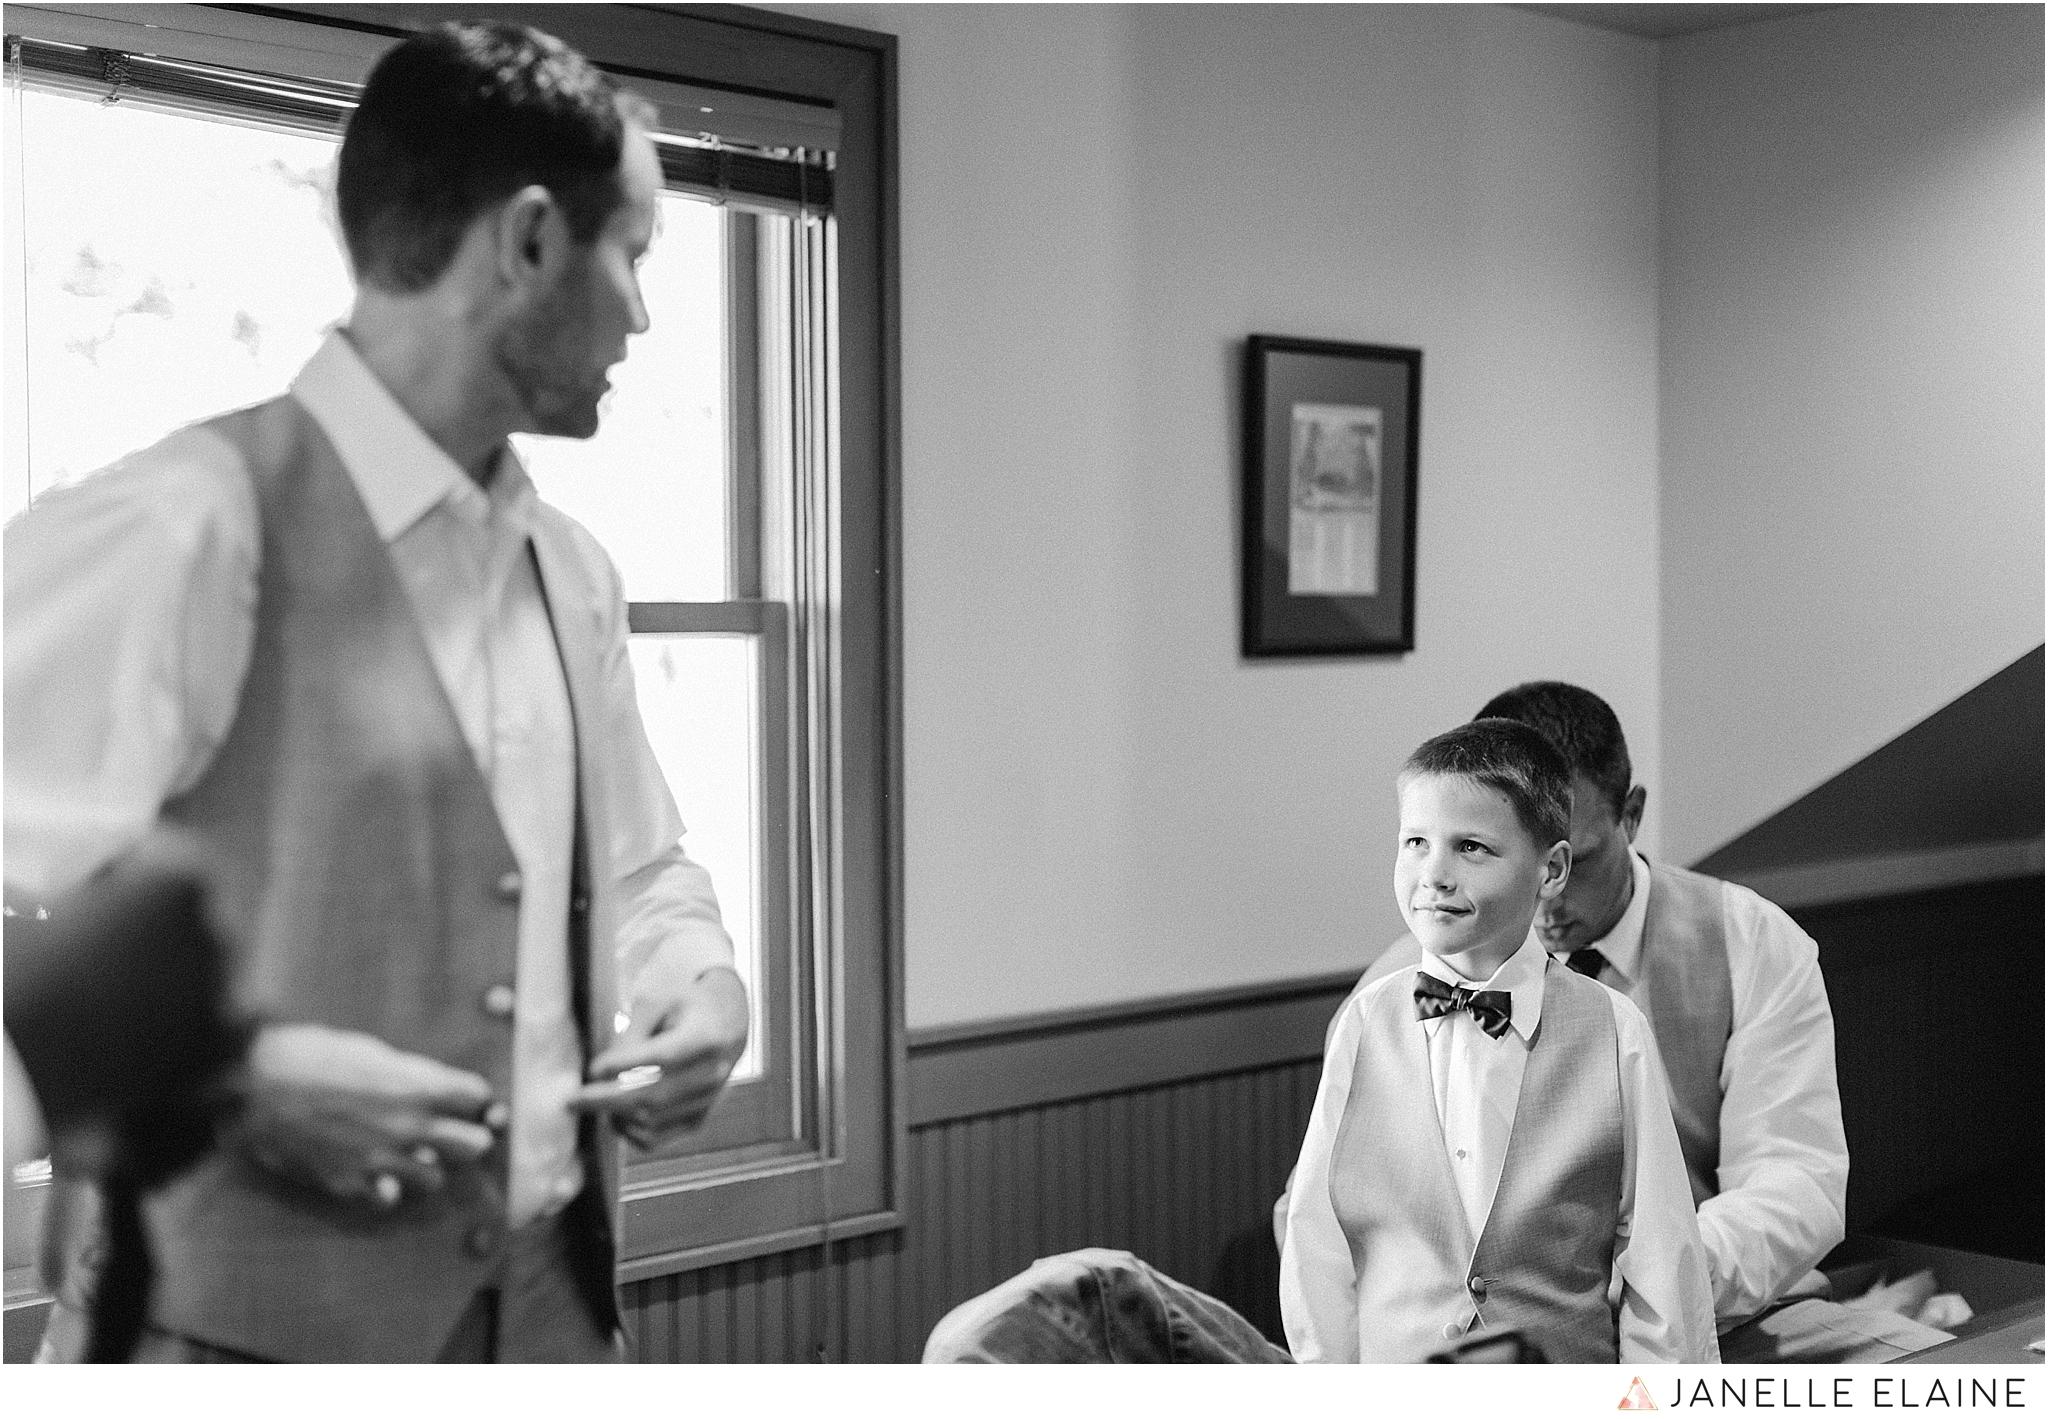 janelle elaine photography-professional wedding photographer-seattle-bellevue-robinswood house-56.jpg